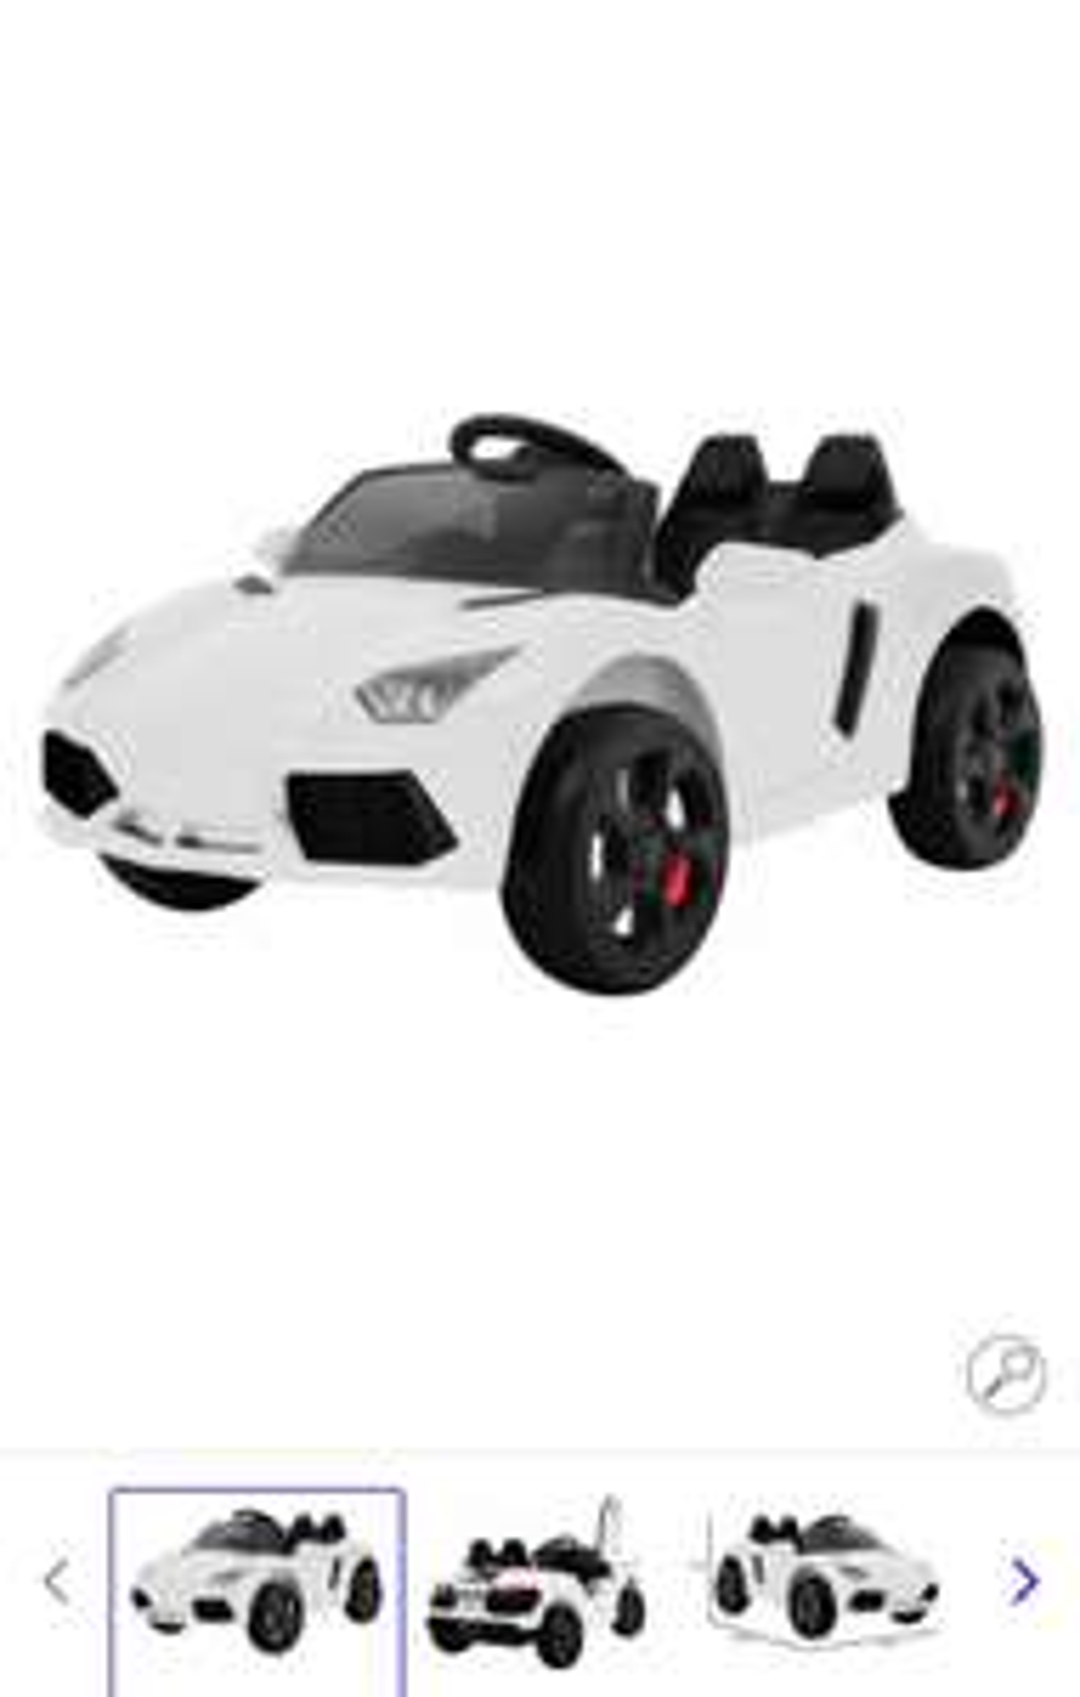 Elektrische Kinder Auto van Toys Ramiz @bol.com